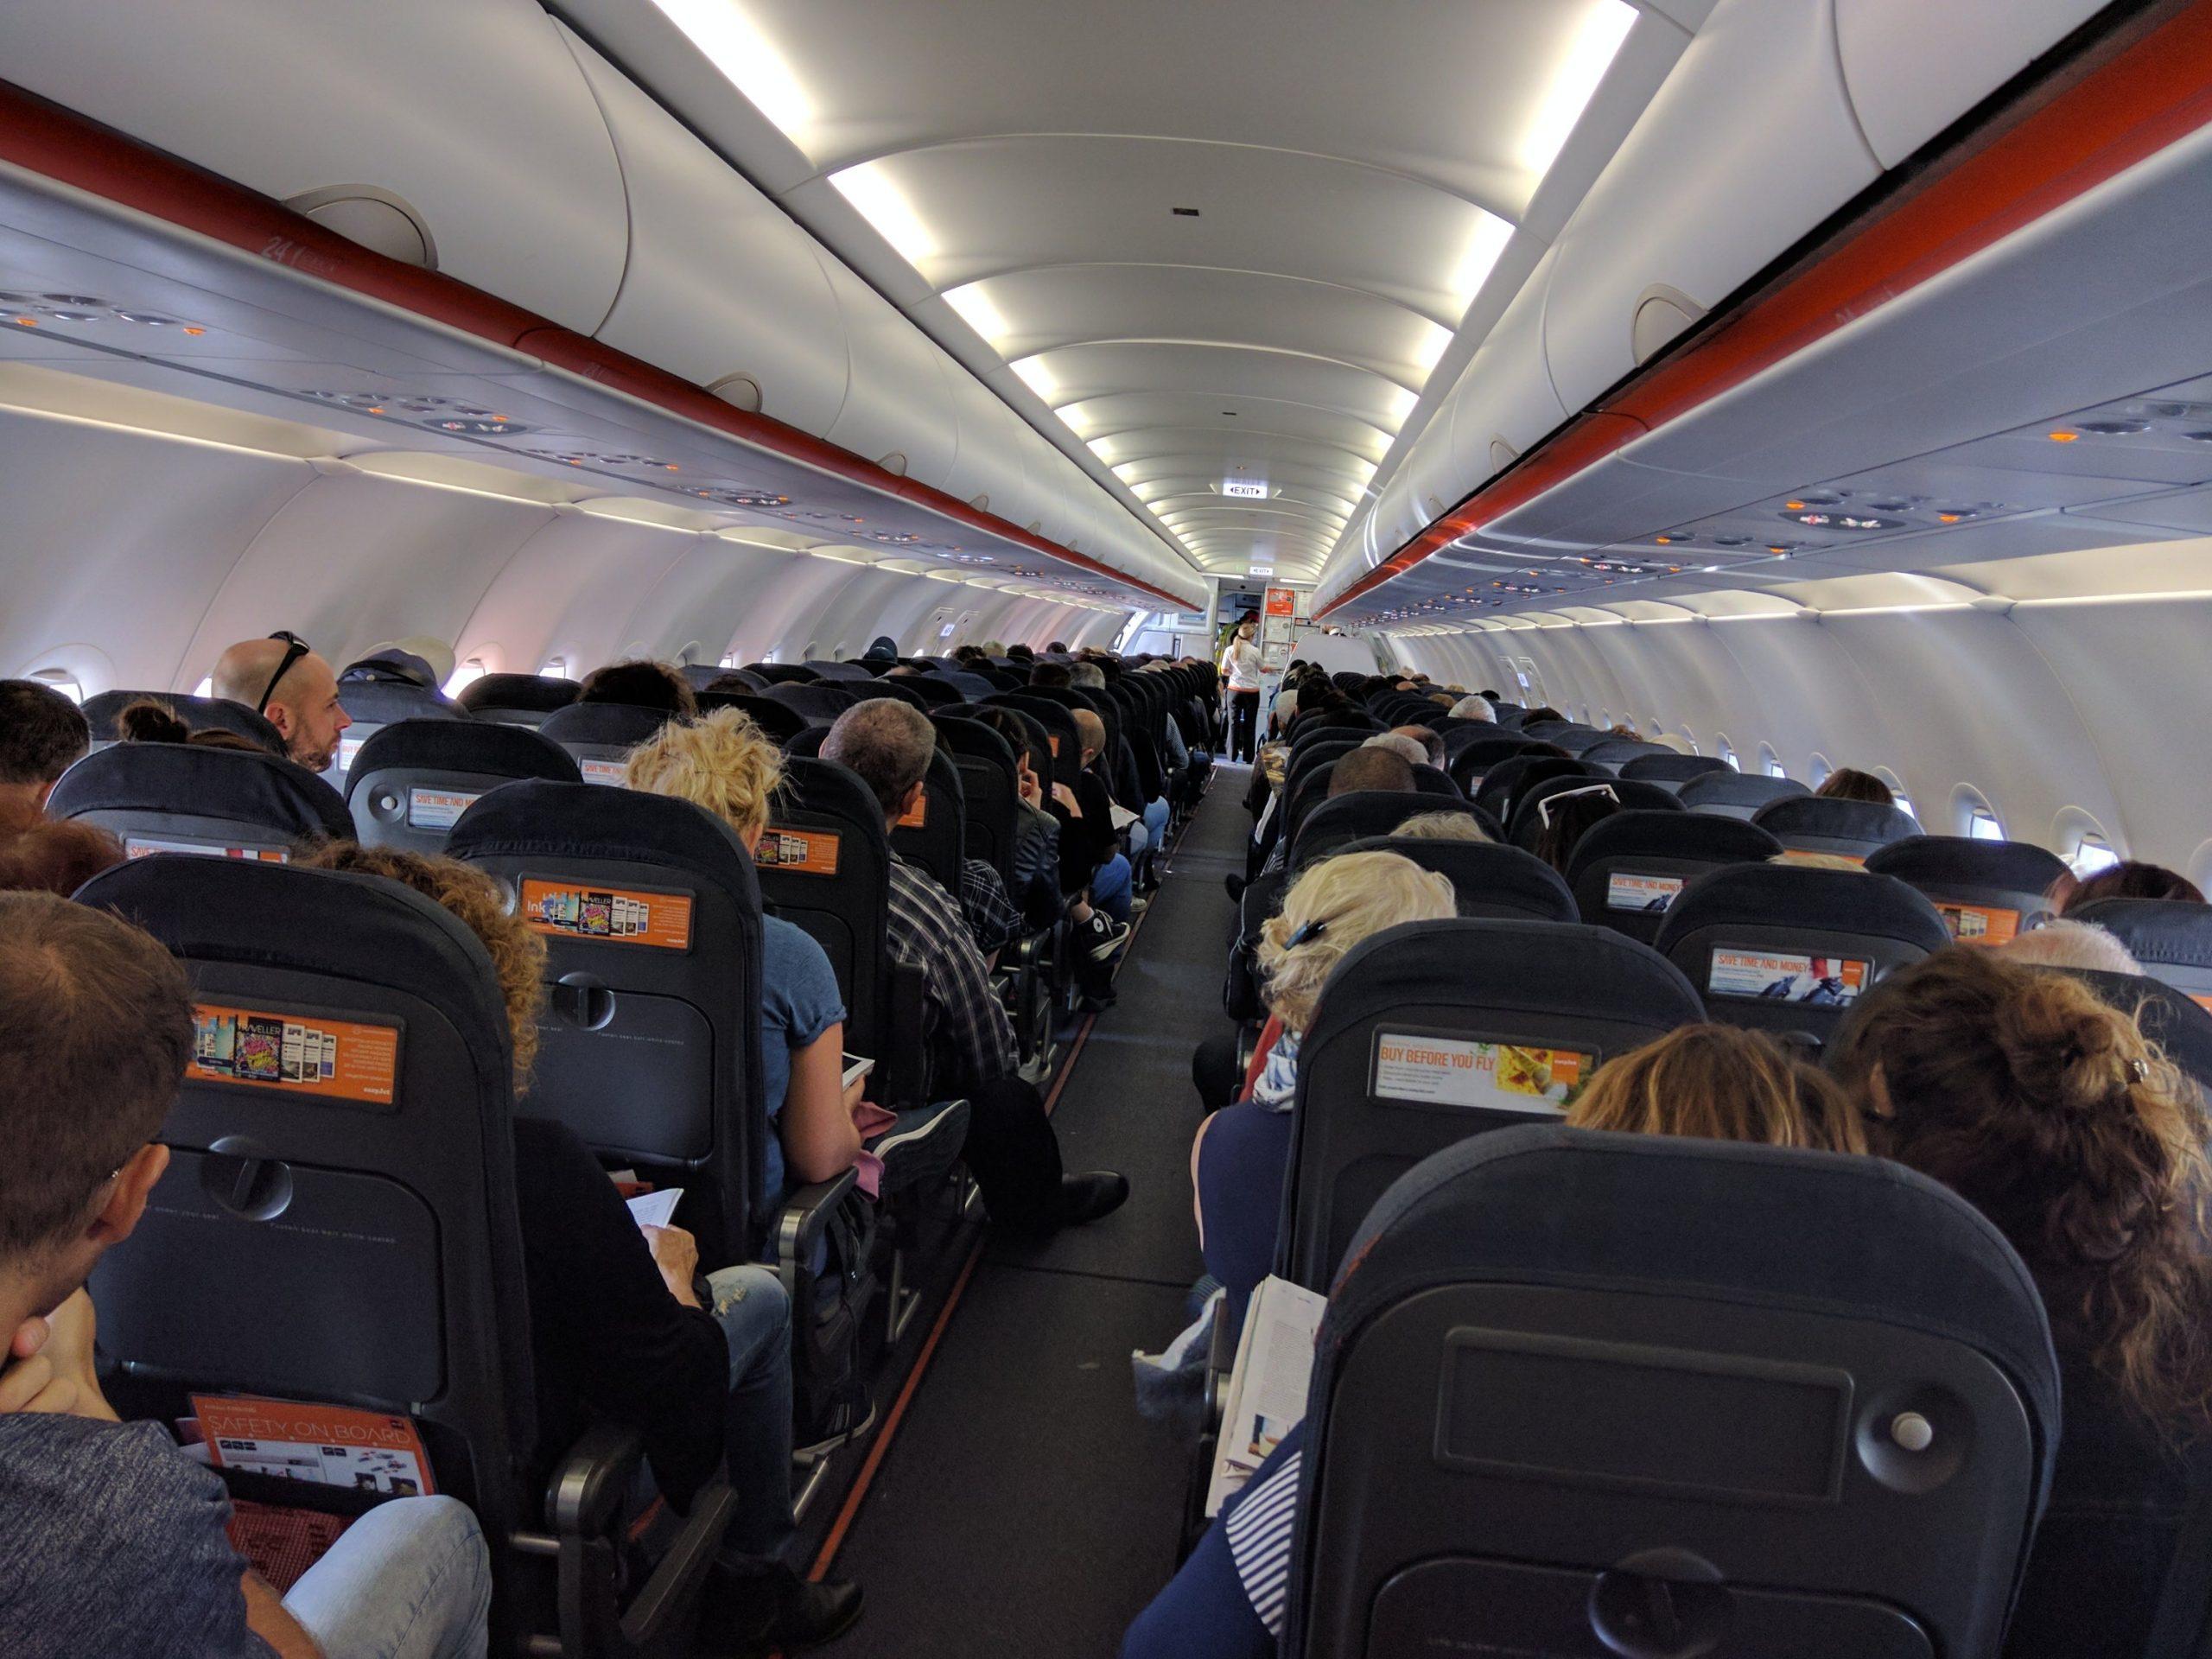 EasyJet Flight